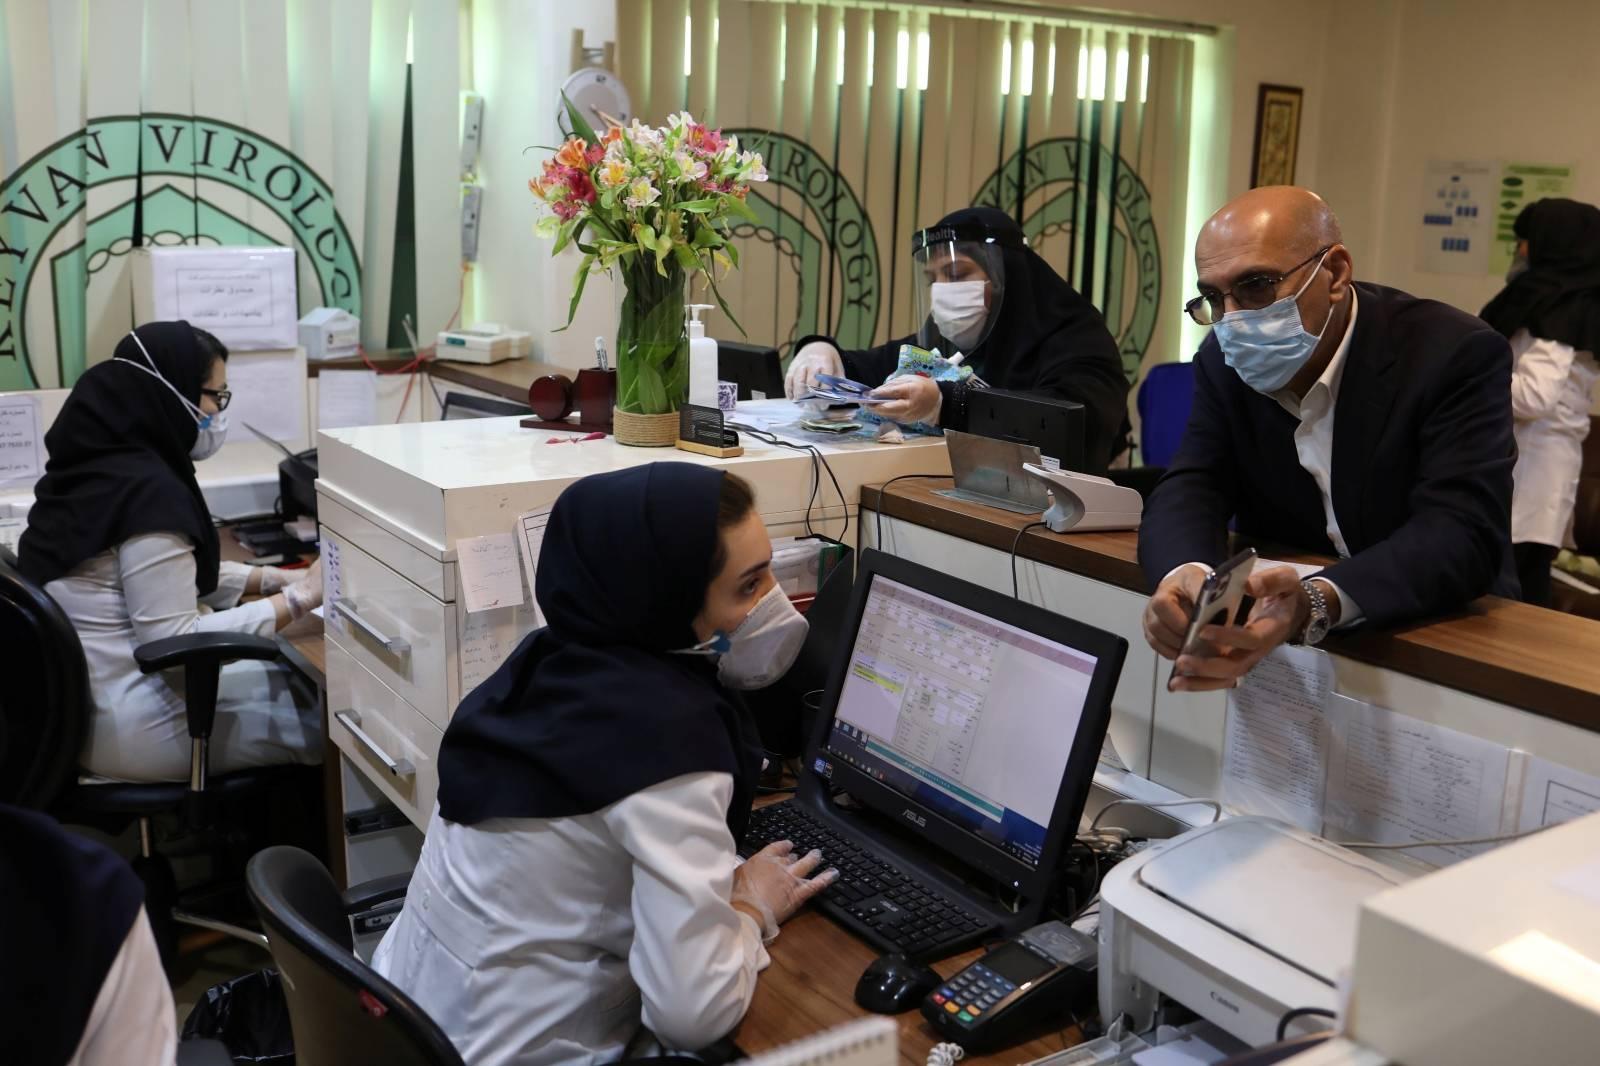 Outbreak of the coronavirus disease (COVID-19) in Tehran